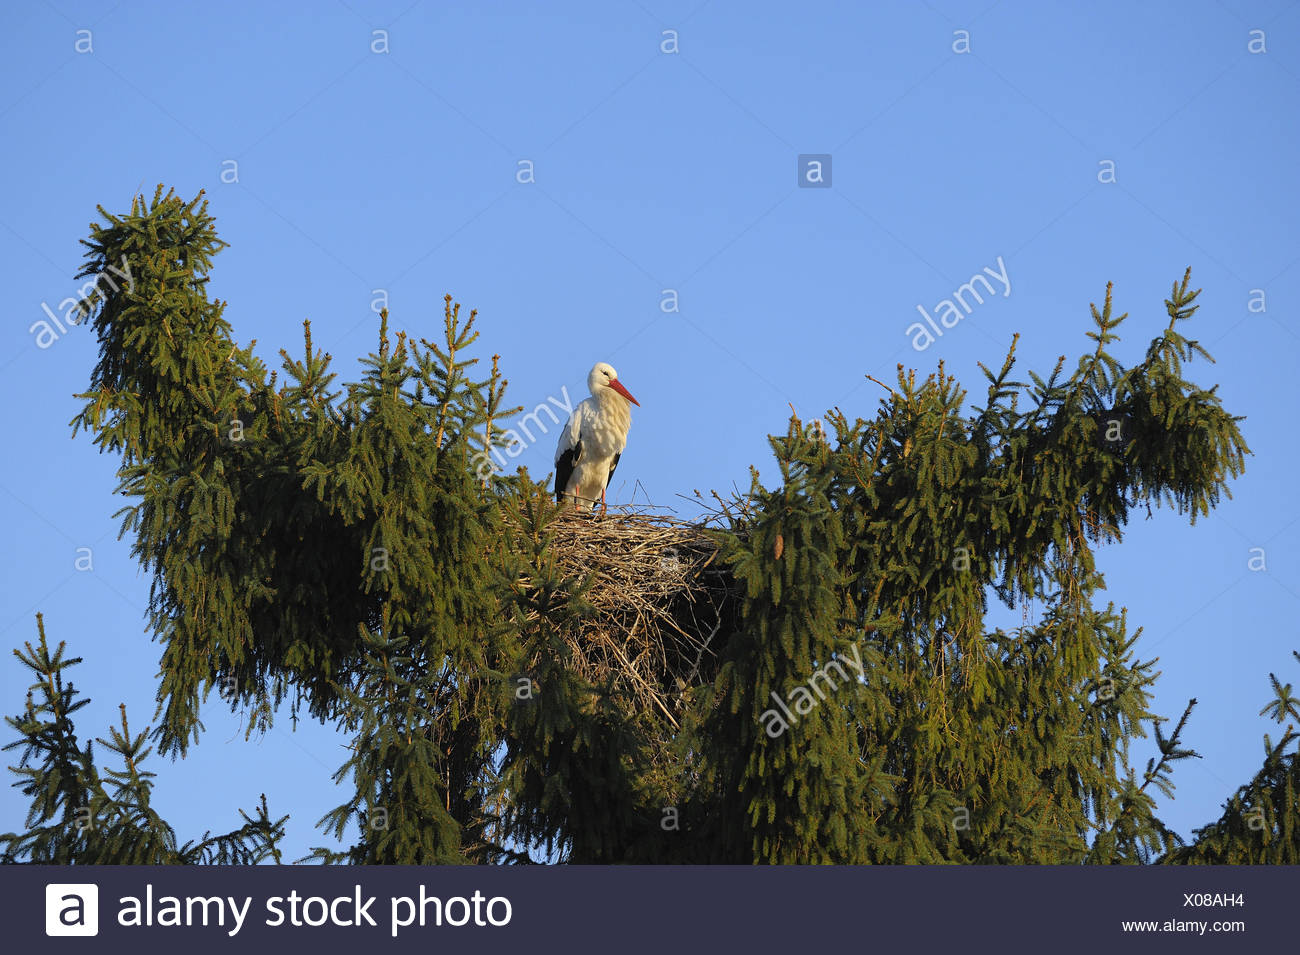 White stork, Germany Stock Photo